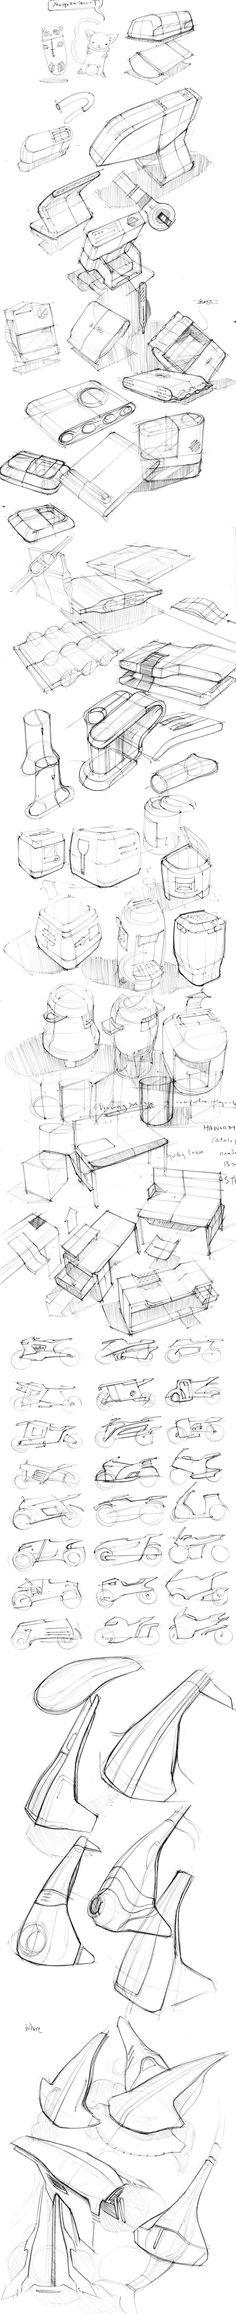 Julius Tarng - Industrial + Interaction Designer